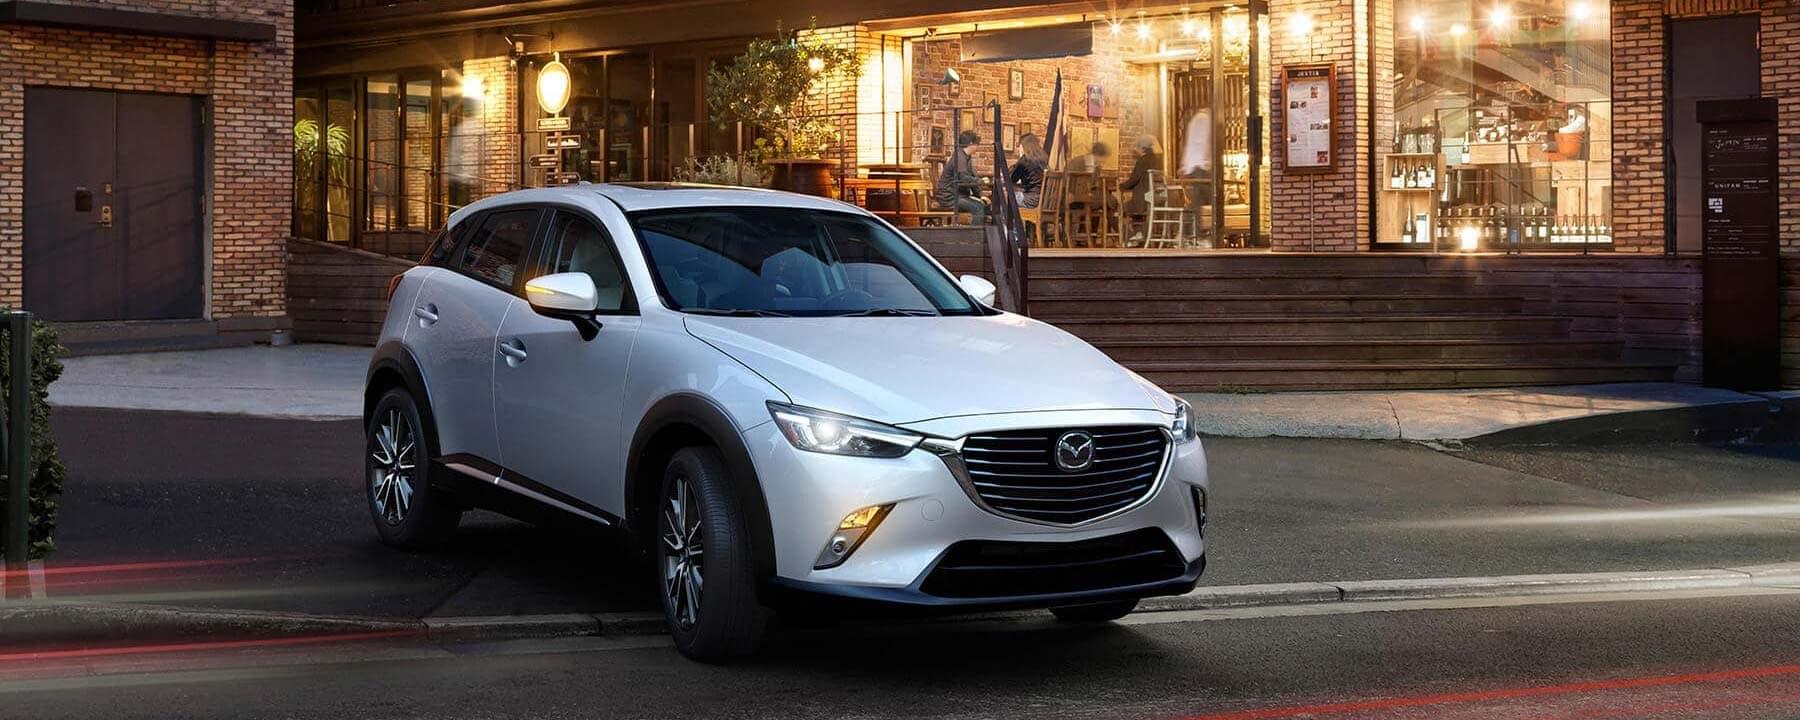 2017 Mazda CX-3 Lineup